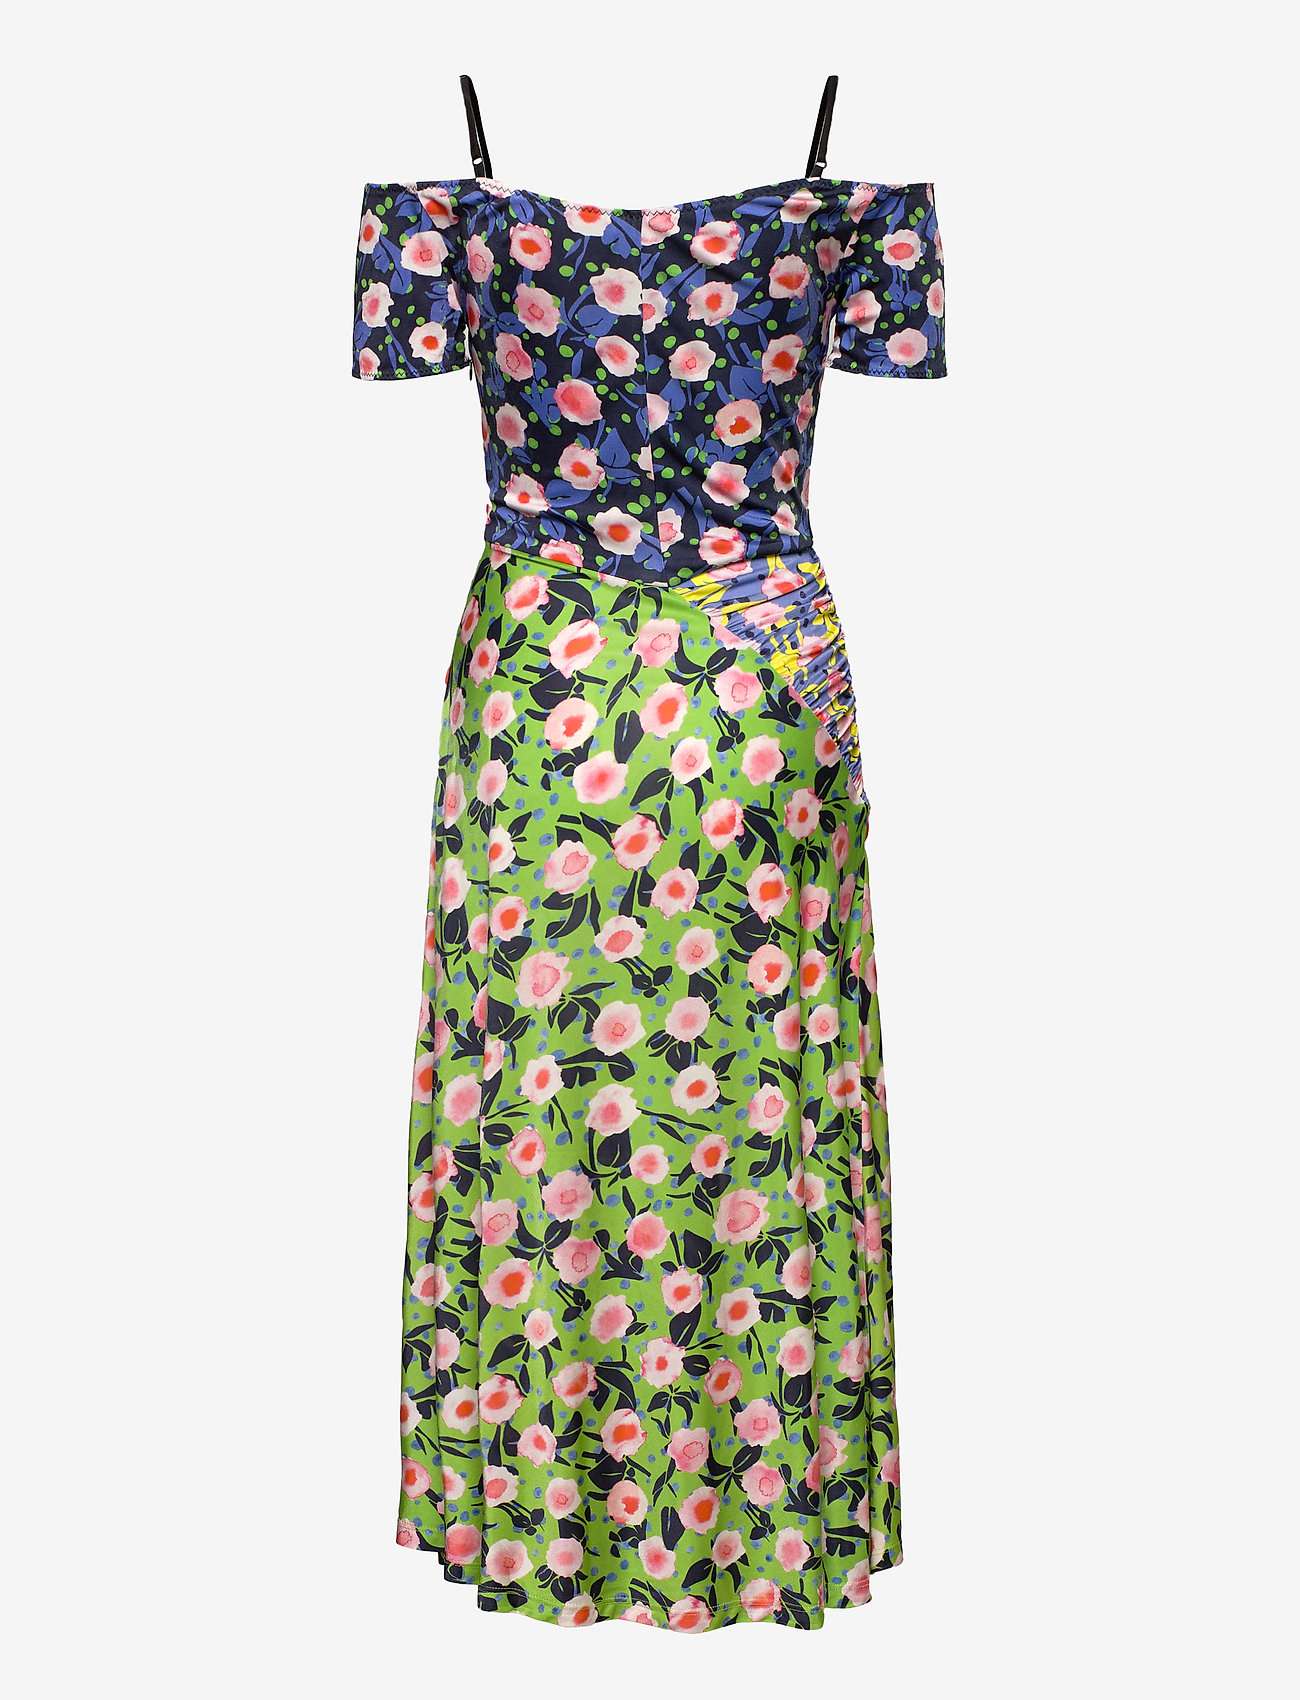 STINE GOYA - Selene, 1163 Viscose Jersey Printed - sommerkjoler - flowermarket mix - 2